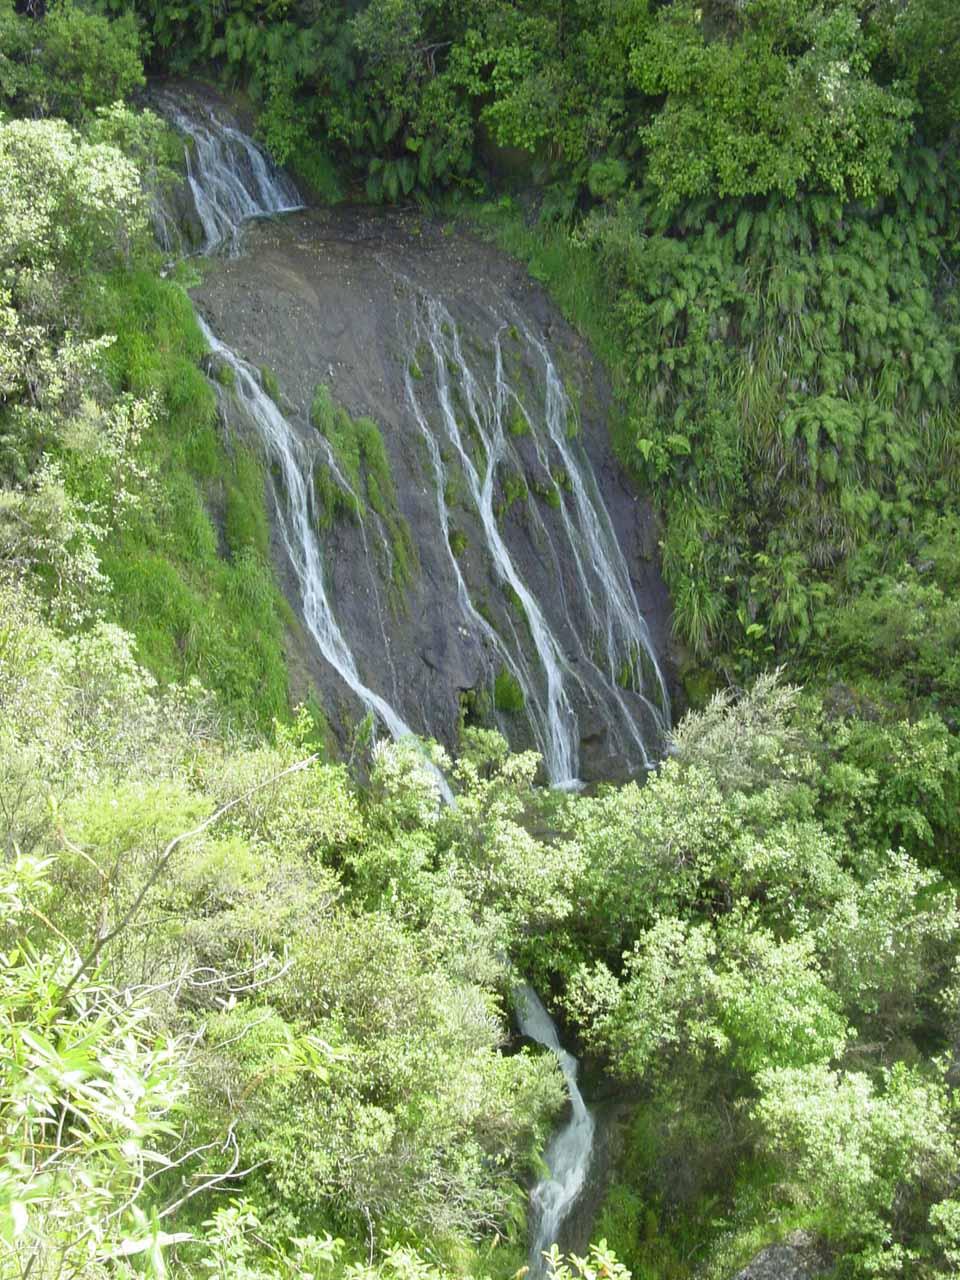 Looking down at the strandy Tangoio Falls